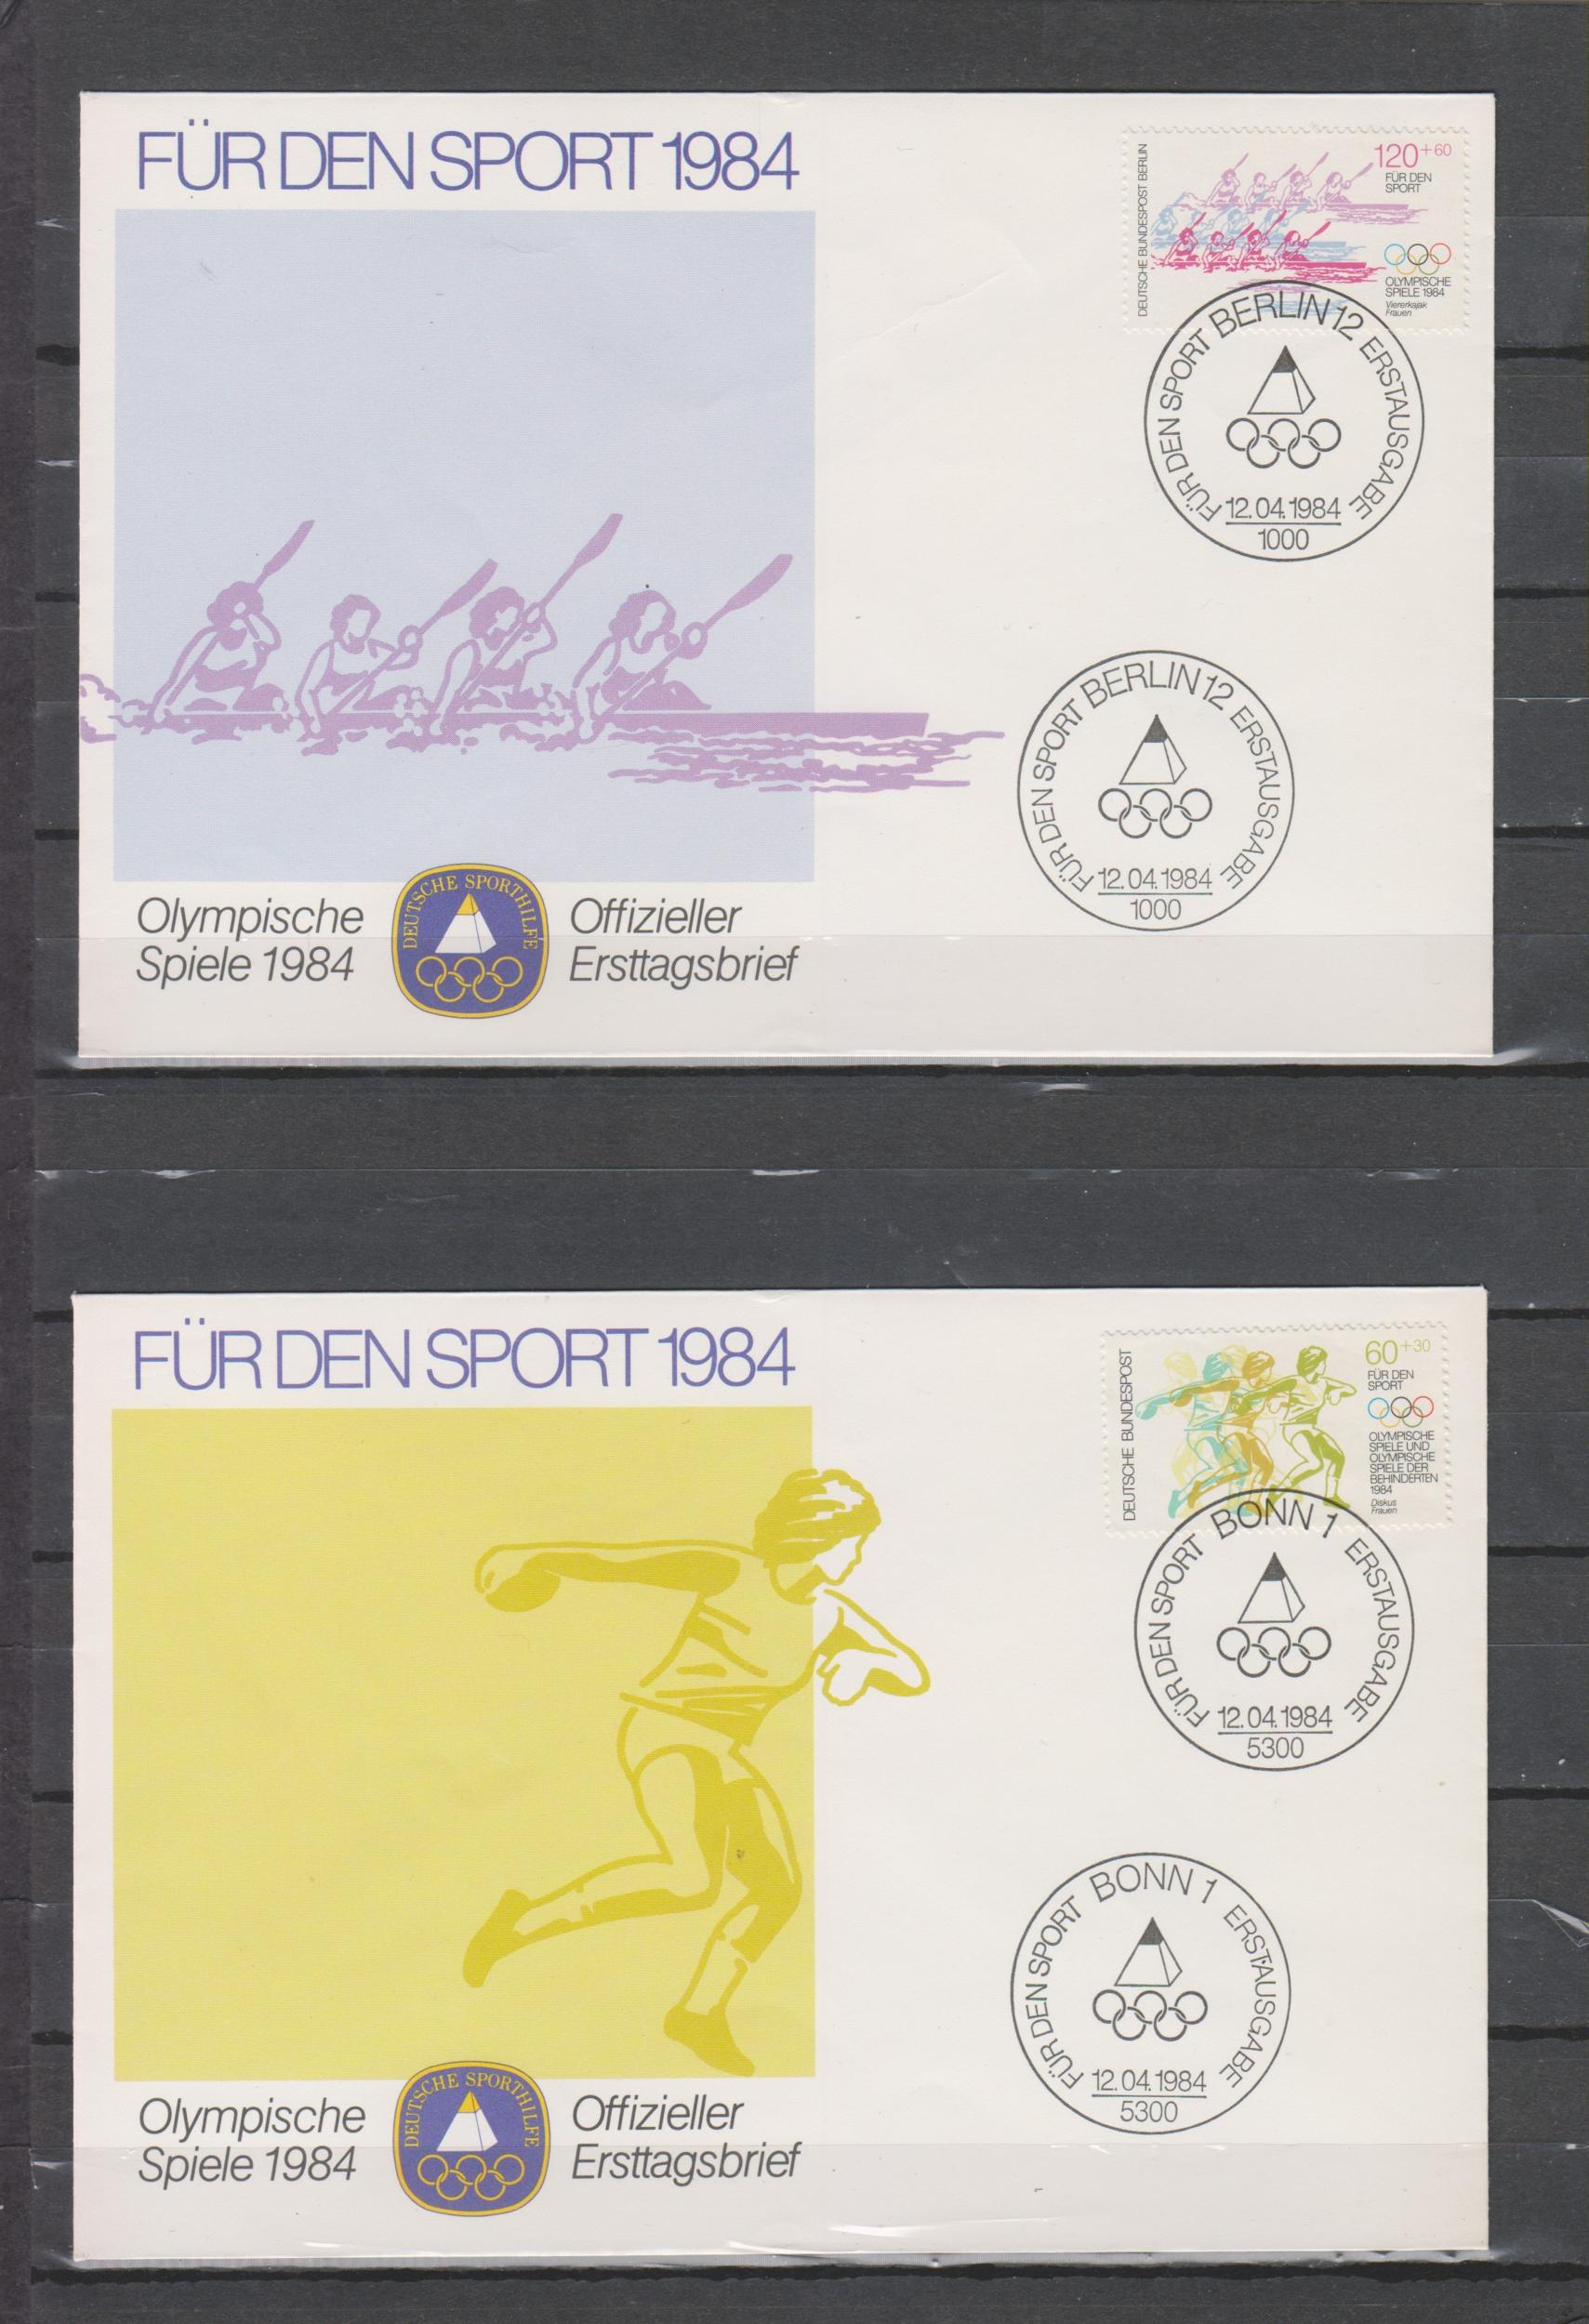 Allemagne - Collection d\'enveloppe FDC J.O. de 1984 (2 photos) - Cote €15